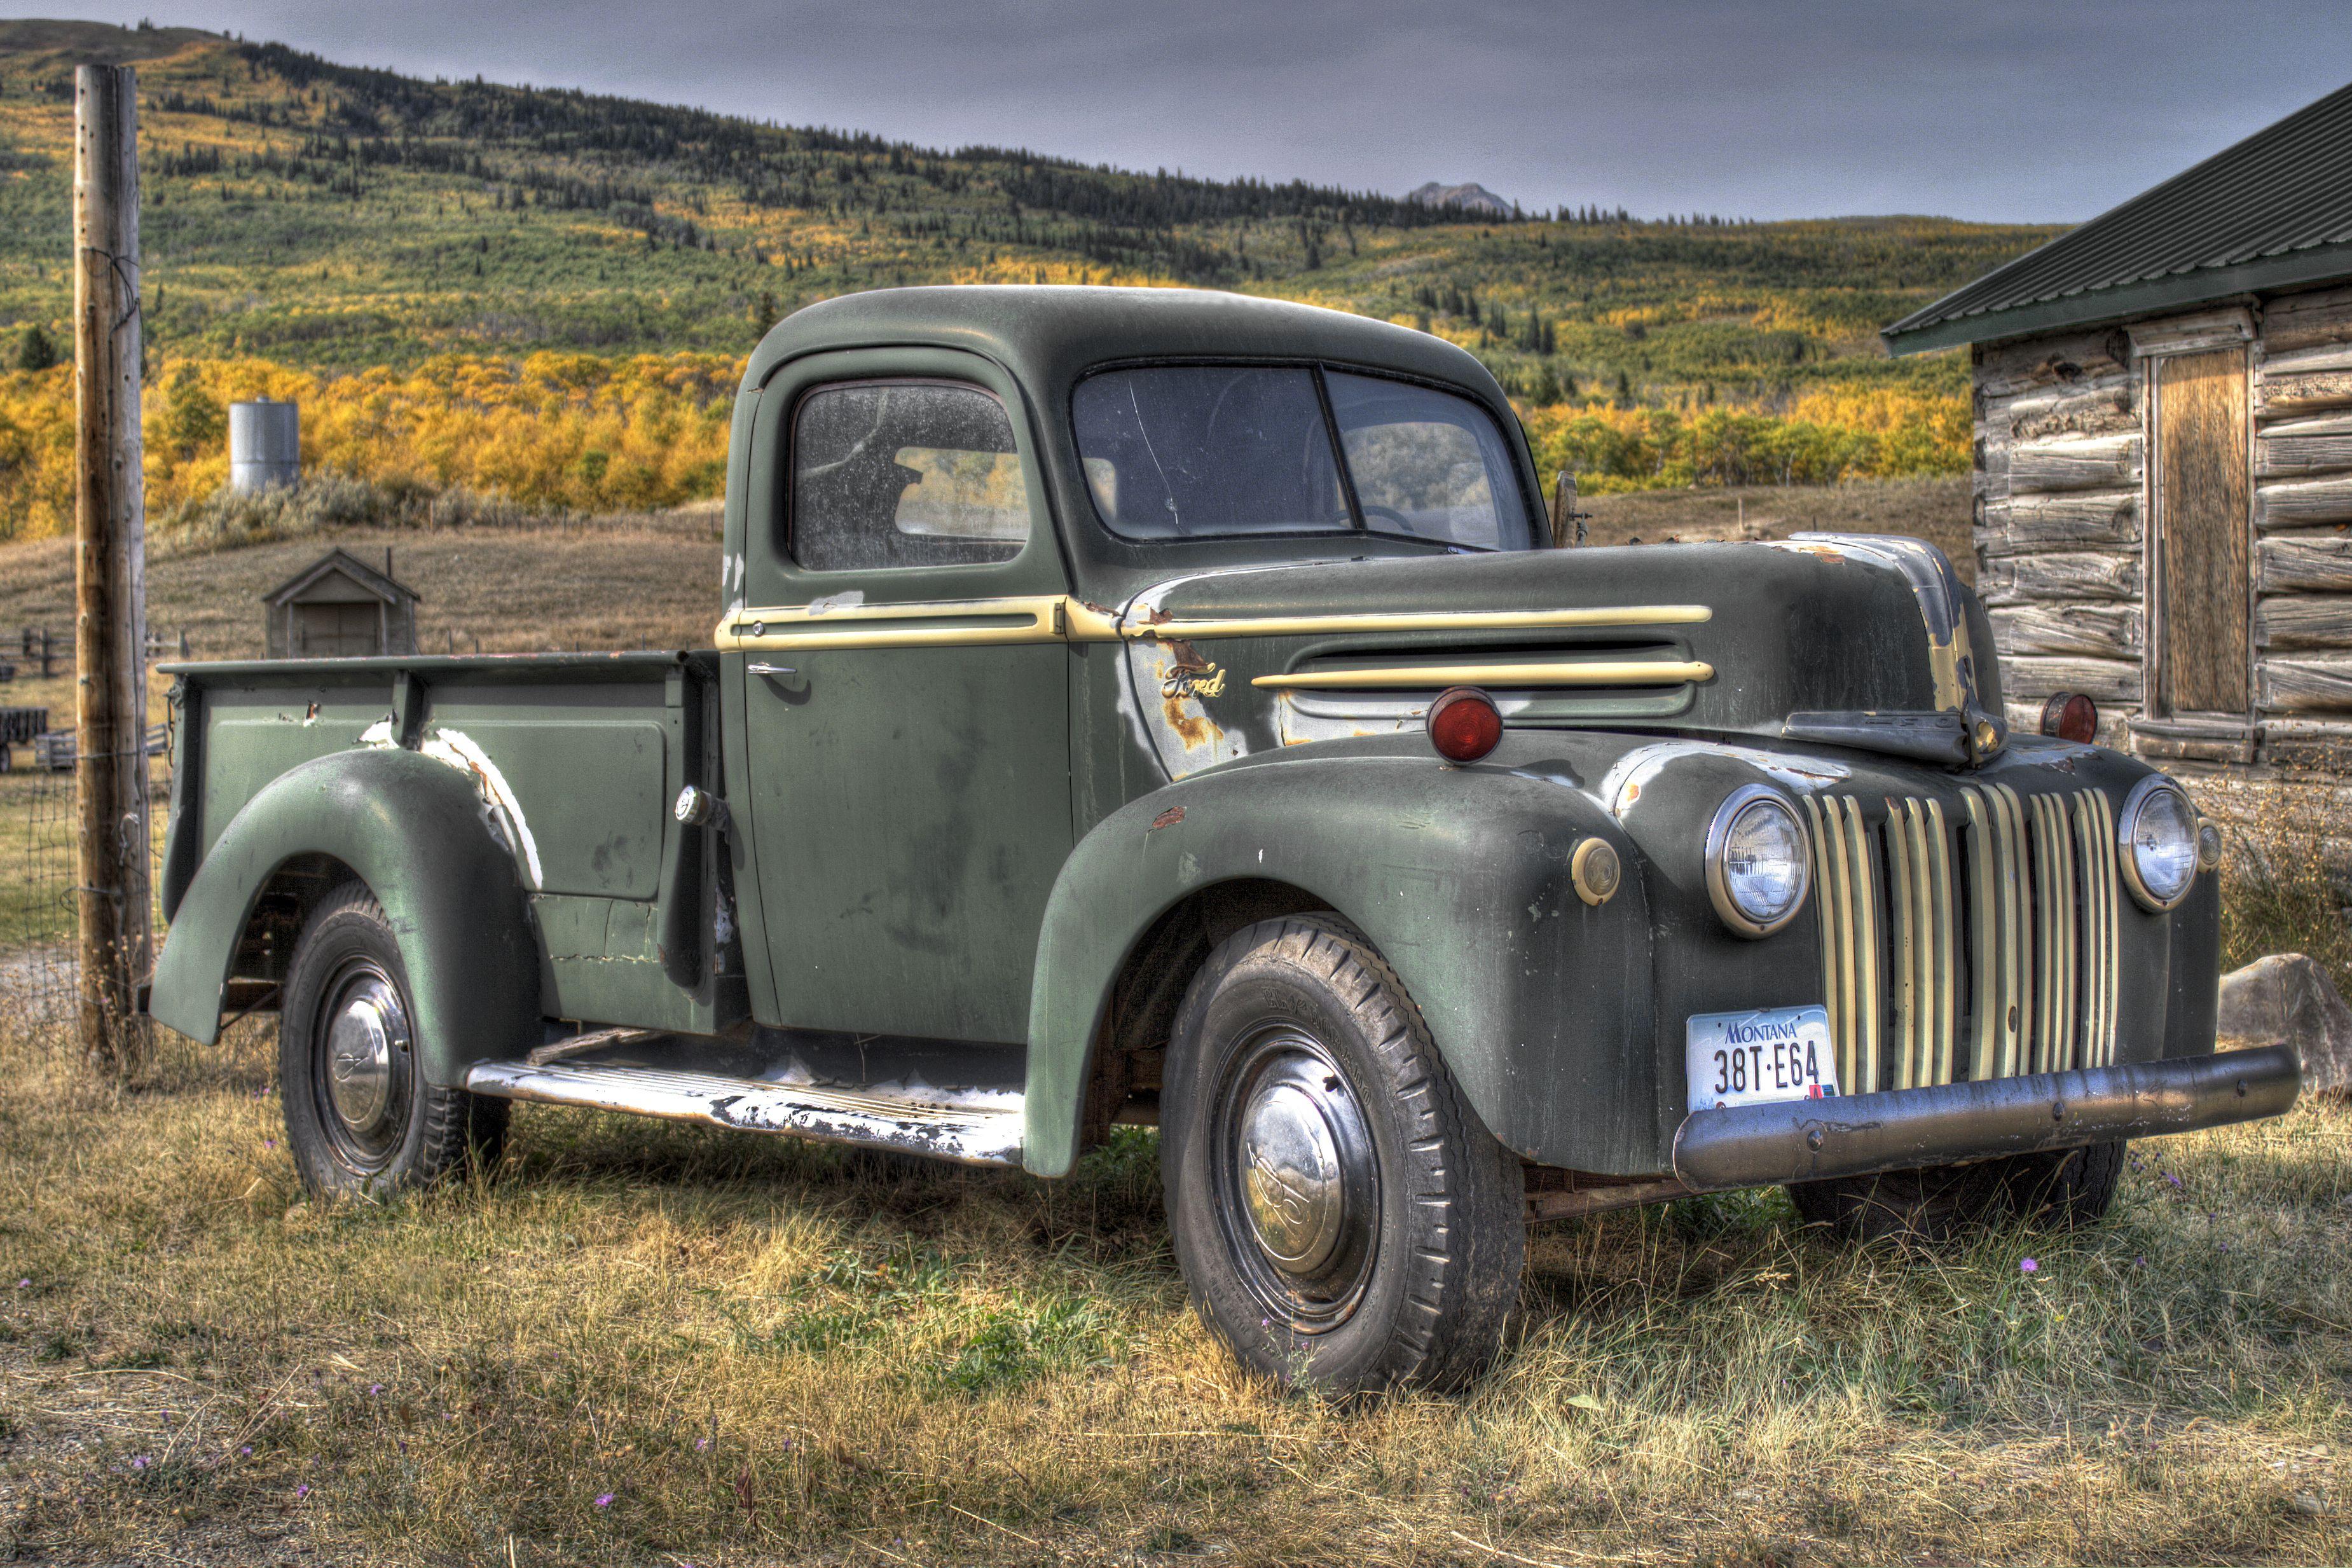 Old Truck, Montana Old trucks, Antique trucks, Vintage